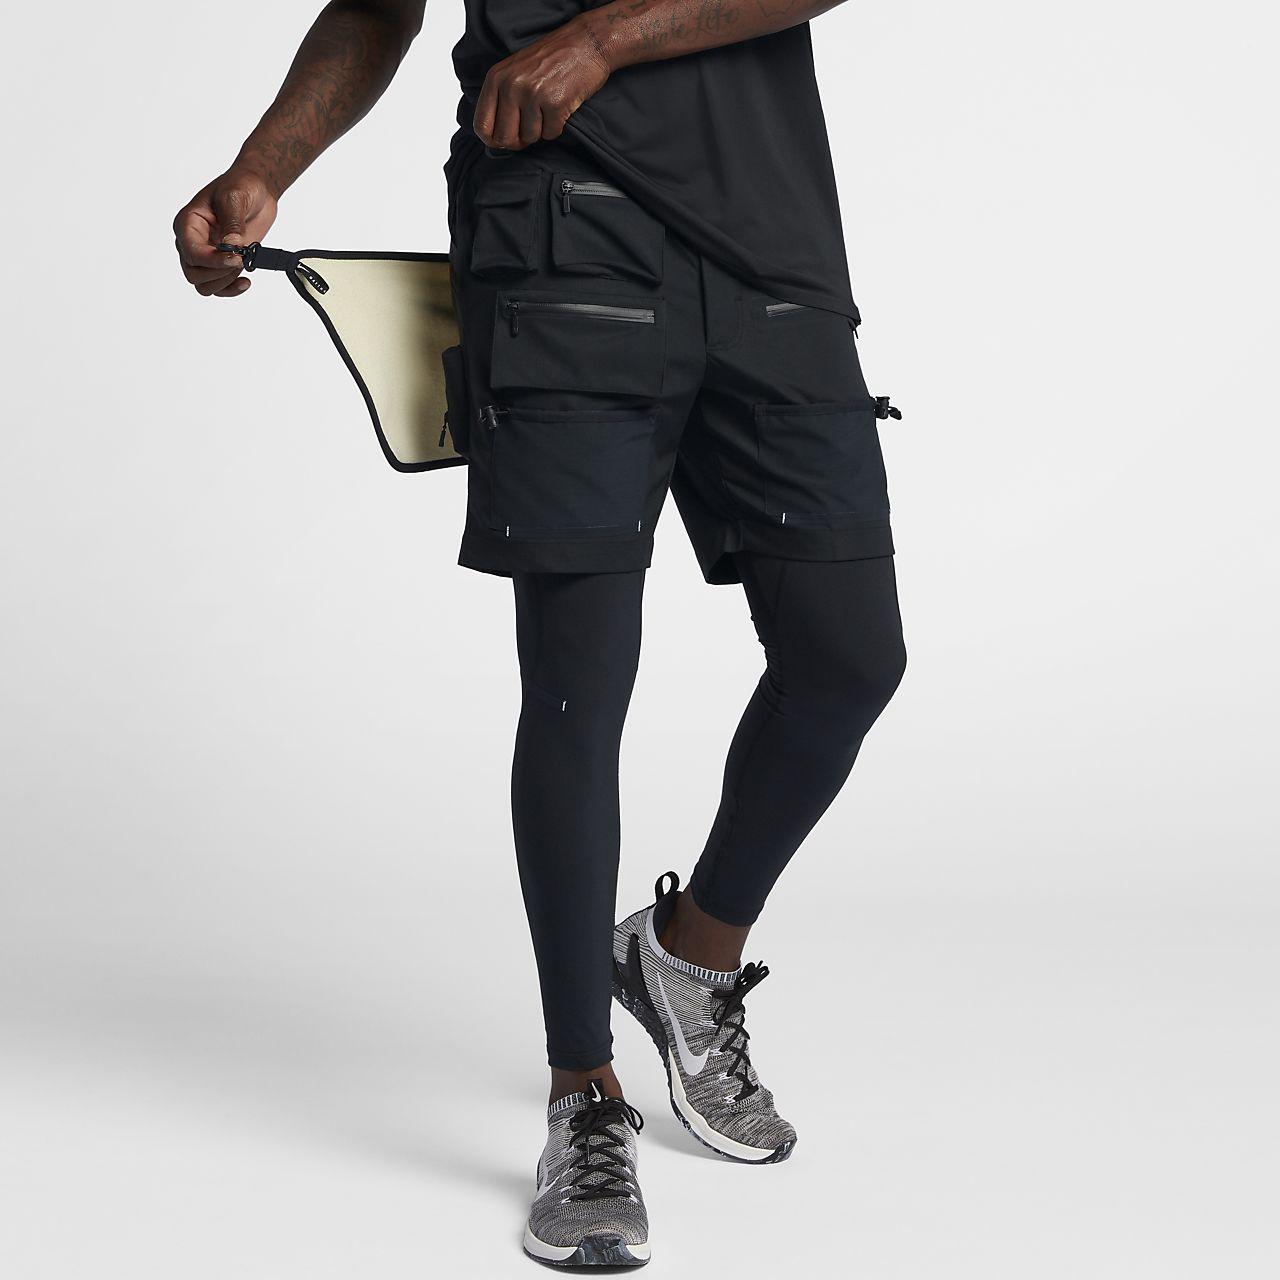 Nike x MMW Hybrid Men's Tights